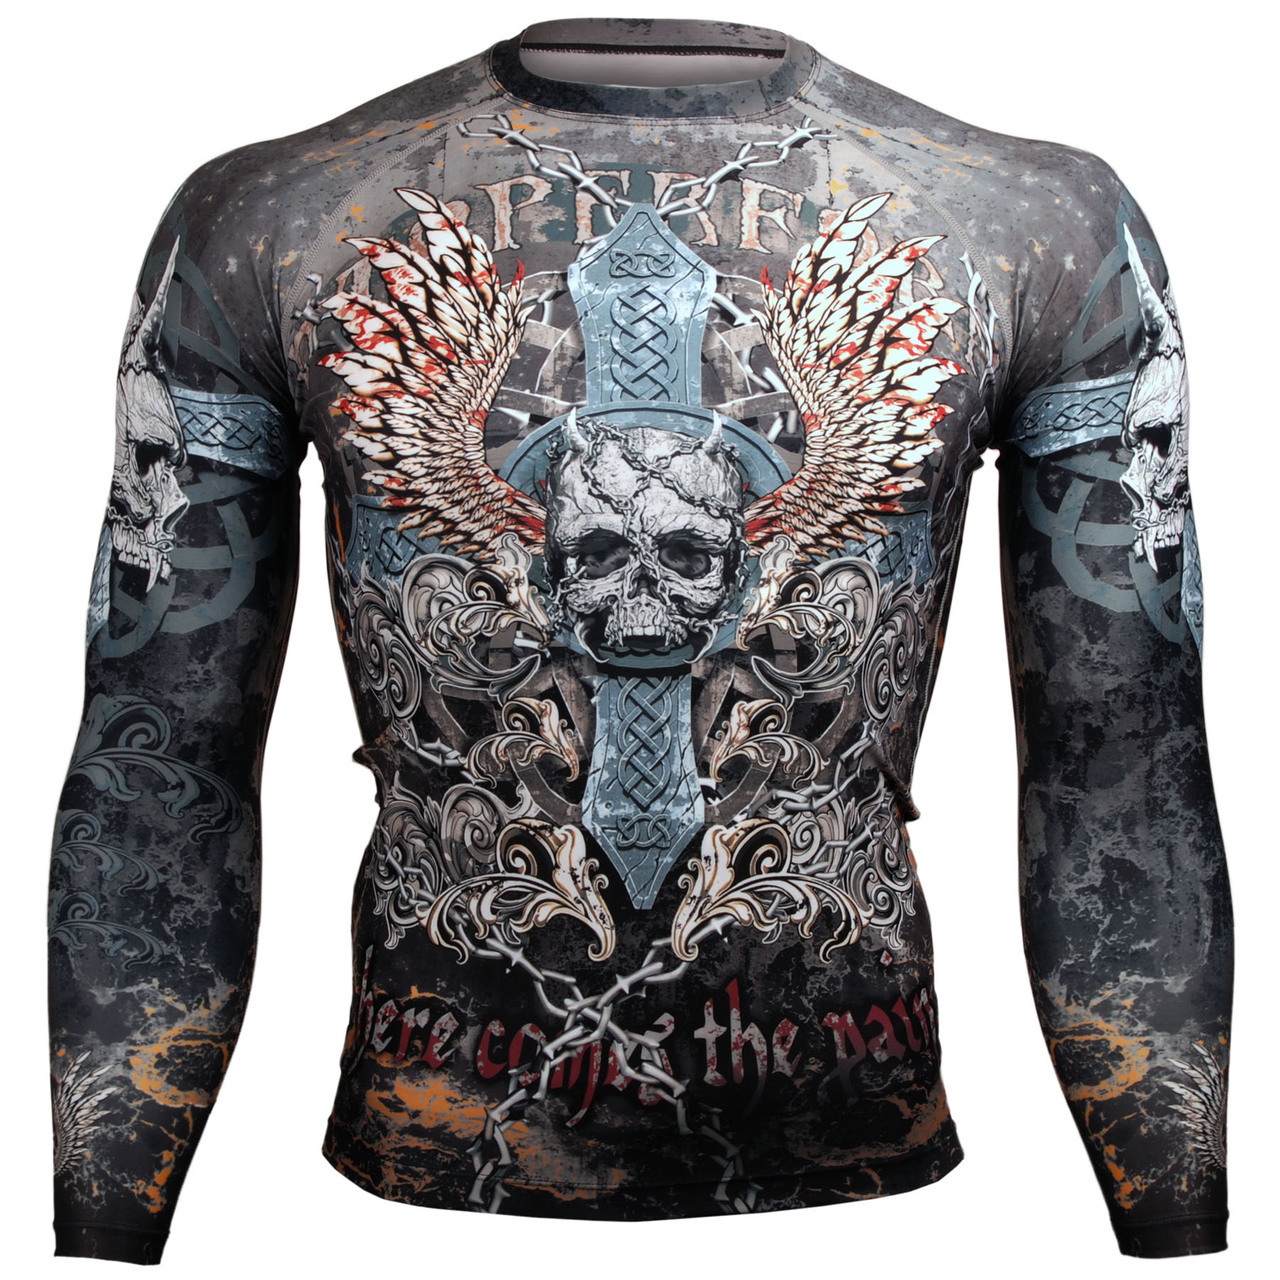 Купить Рашгард Btoperform Skull Cross FX-106, 4717_br